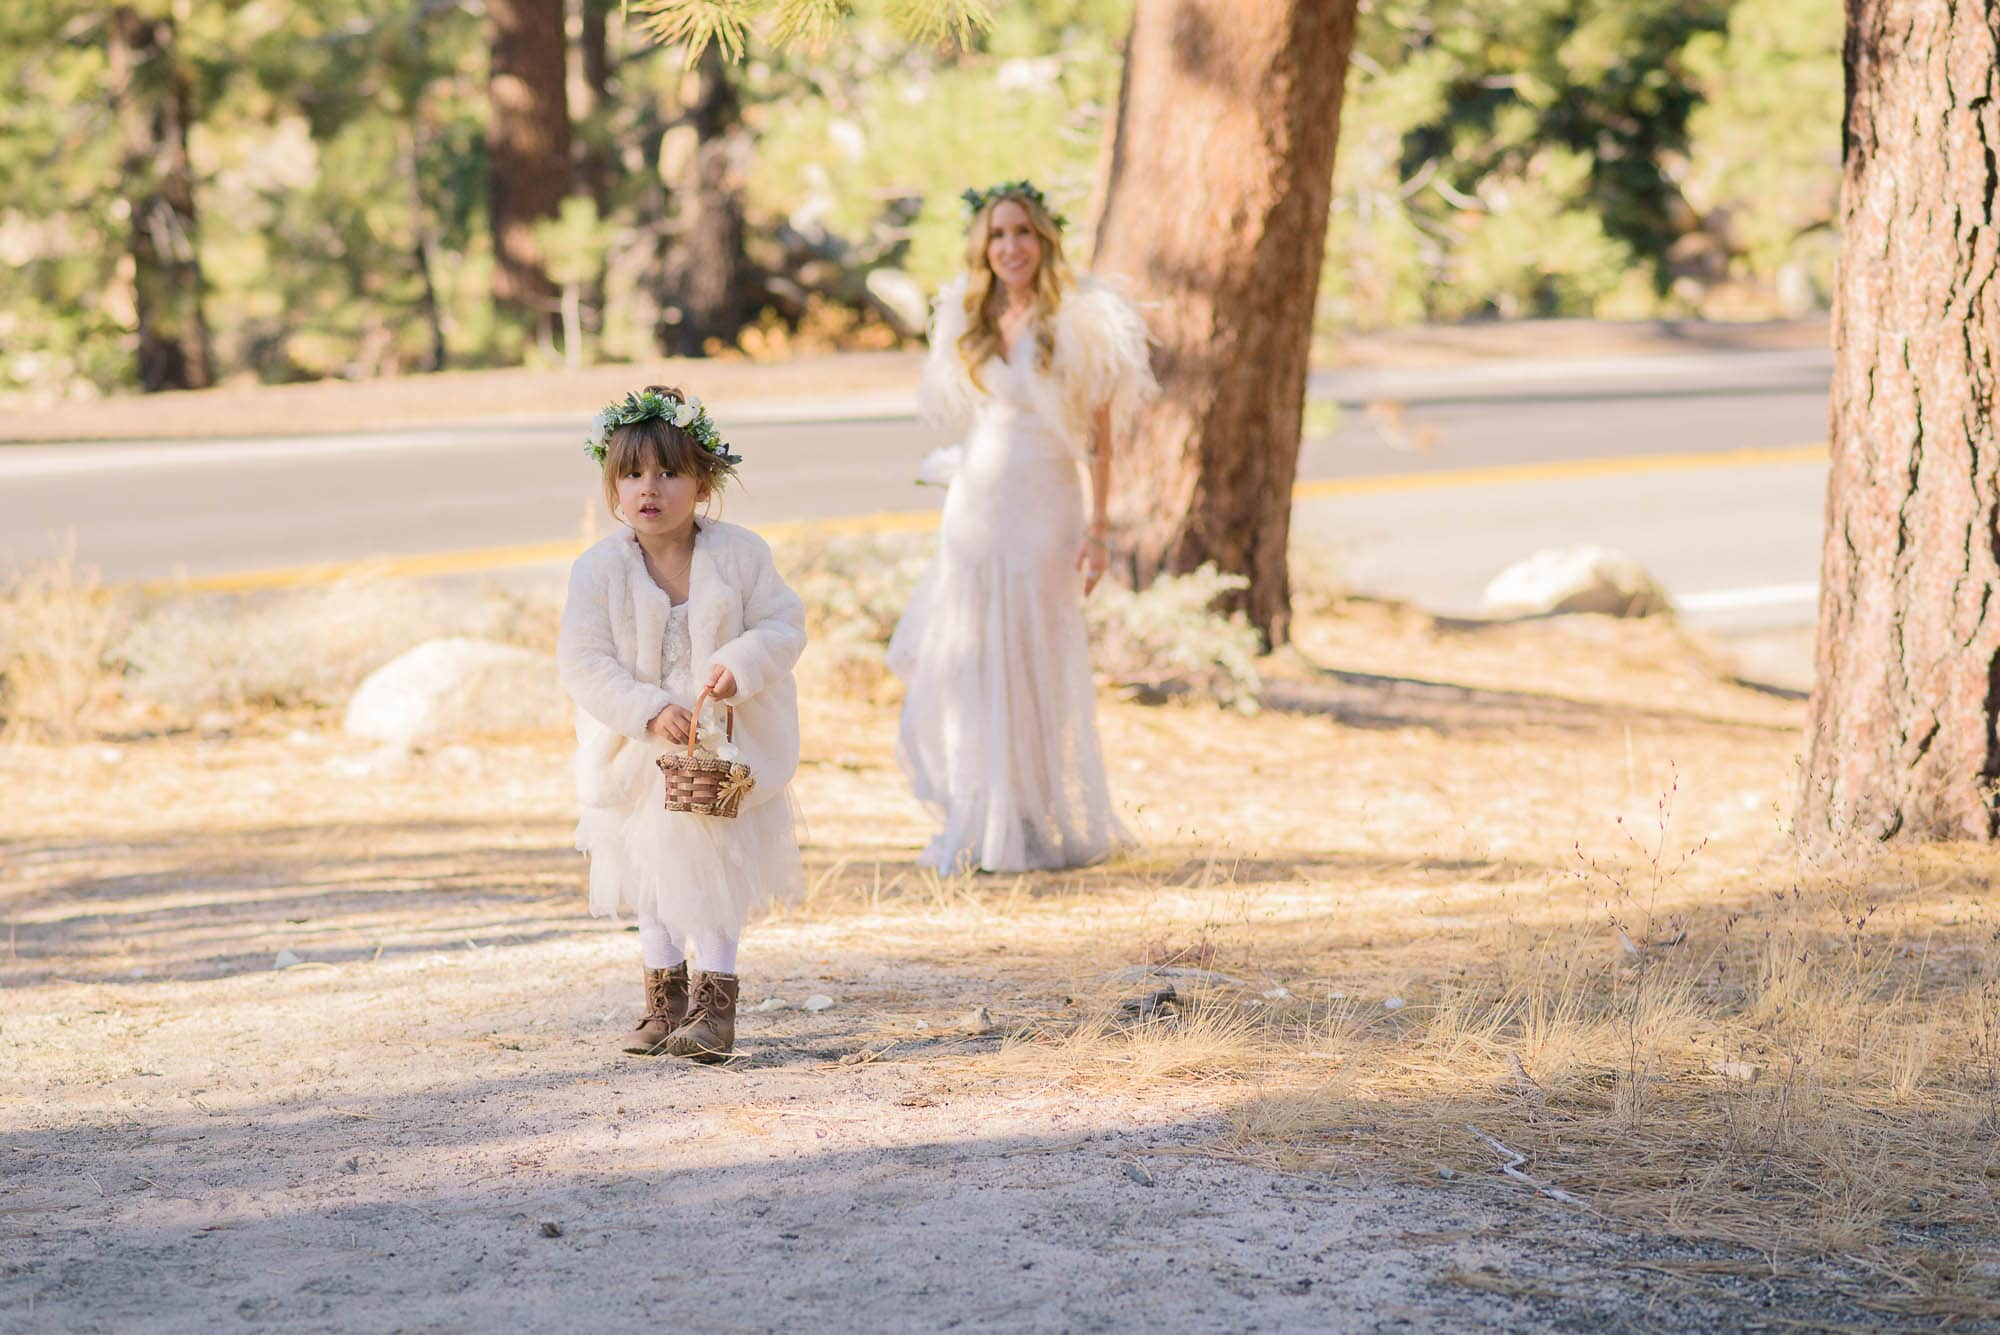 003_Alan_and_Heidi_Wedding_Natalie_Mike